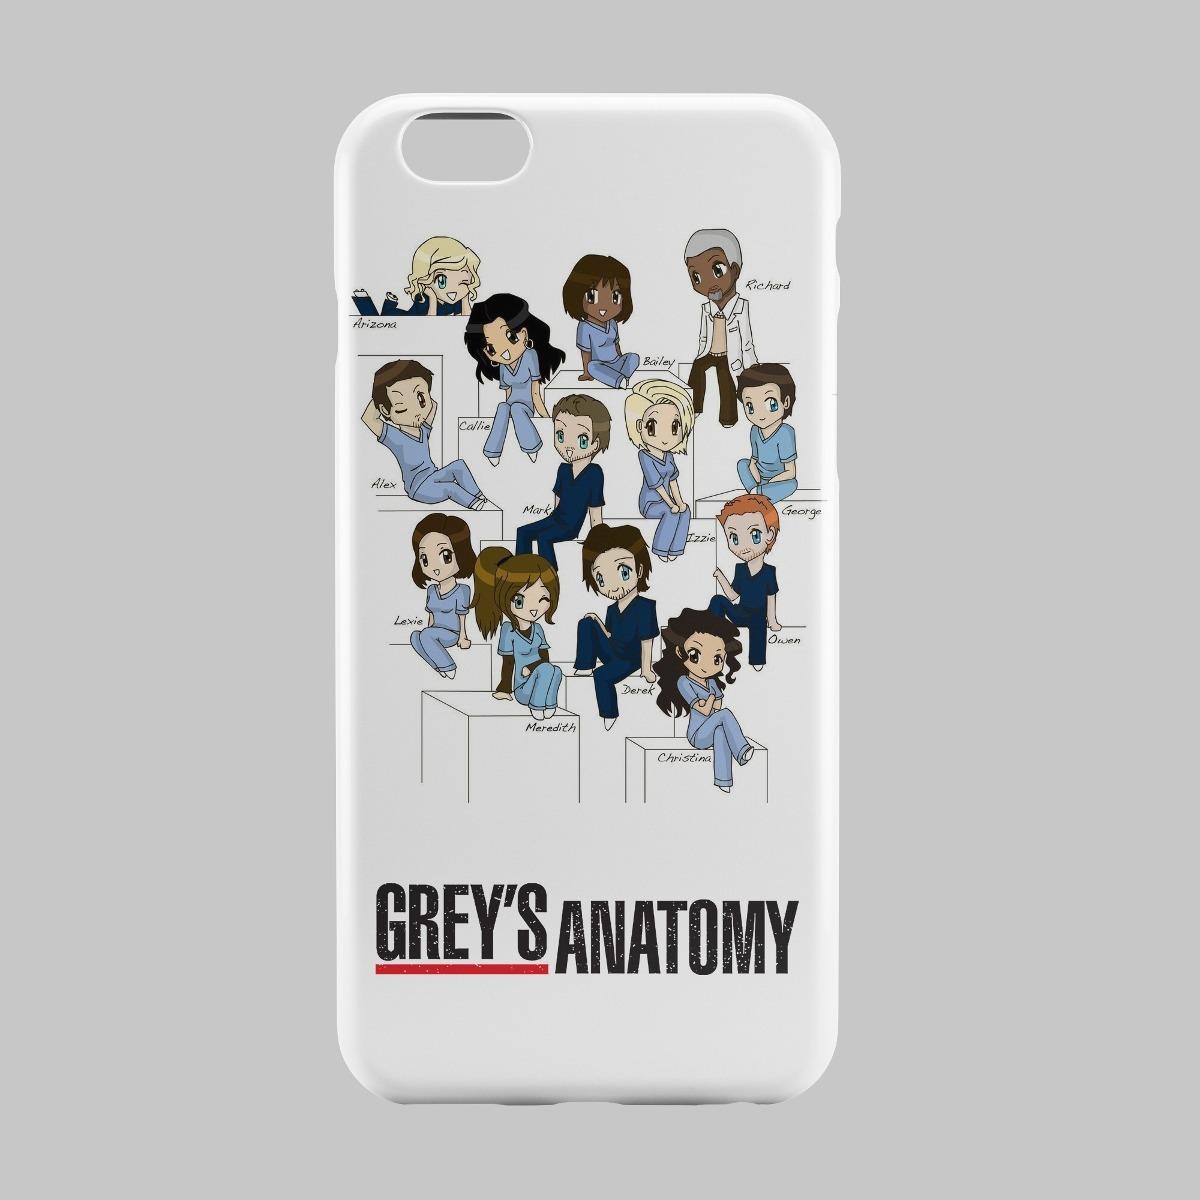 Beste Anatomie Eines Iphone 5 Ideen - Anatomie Ideen - finotti.info